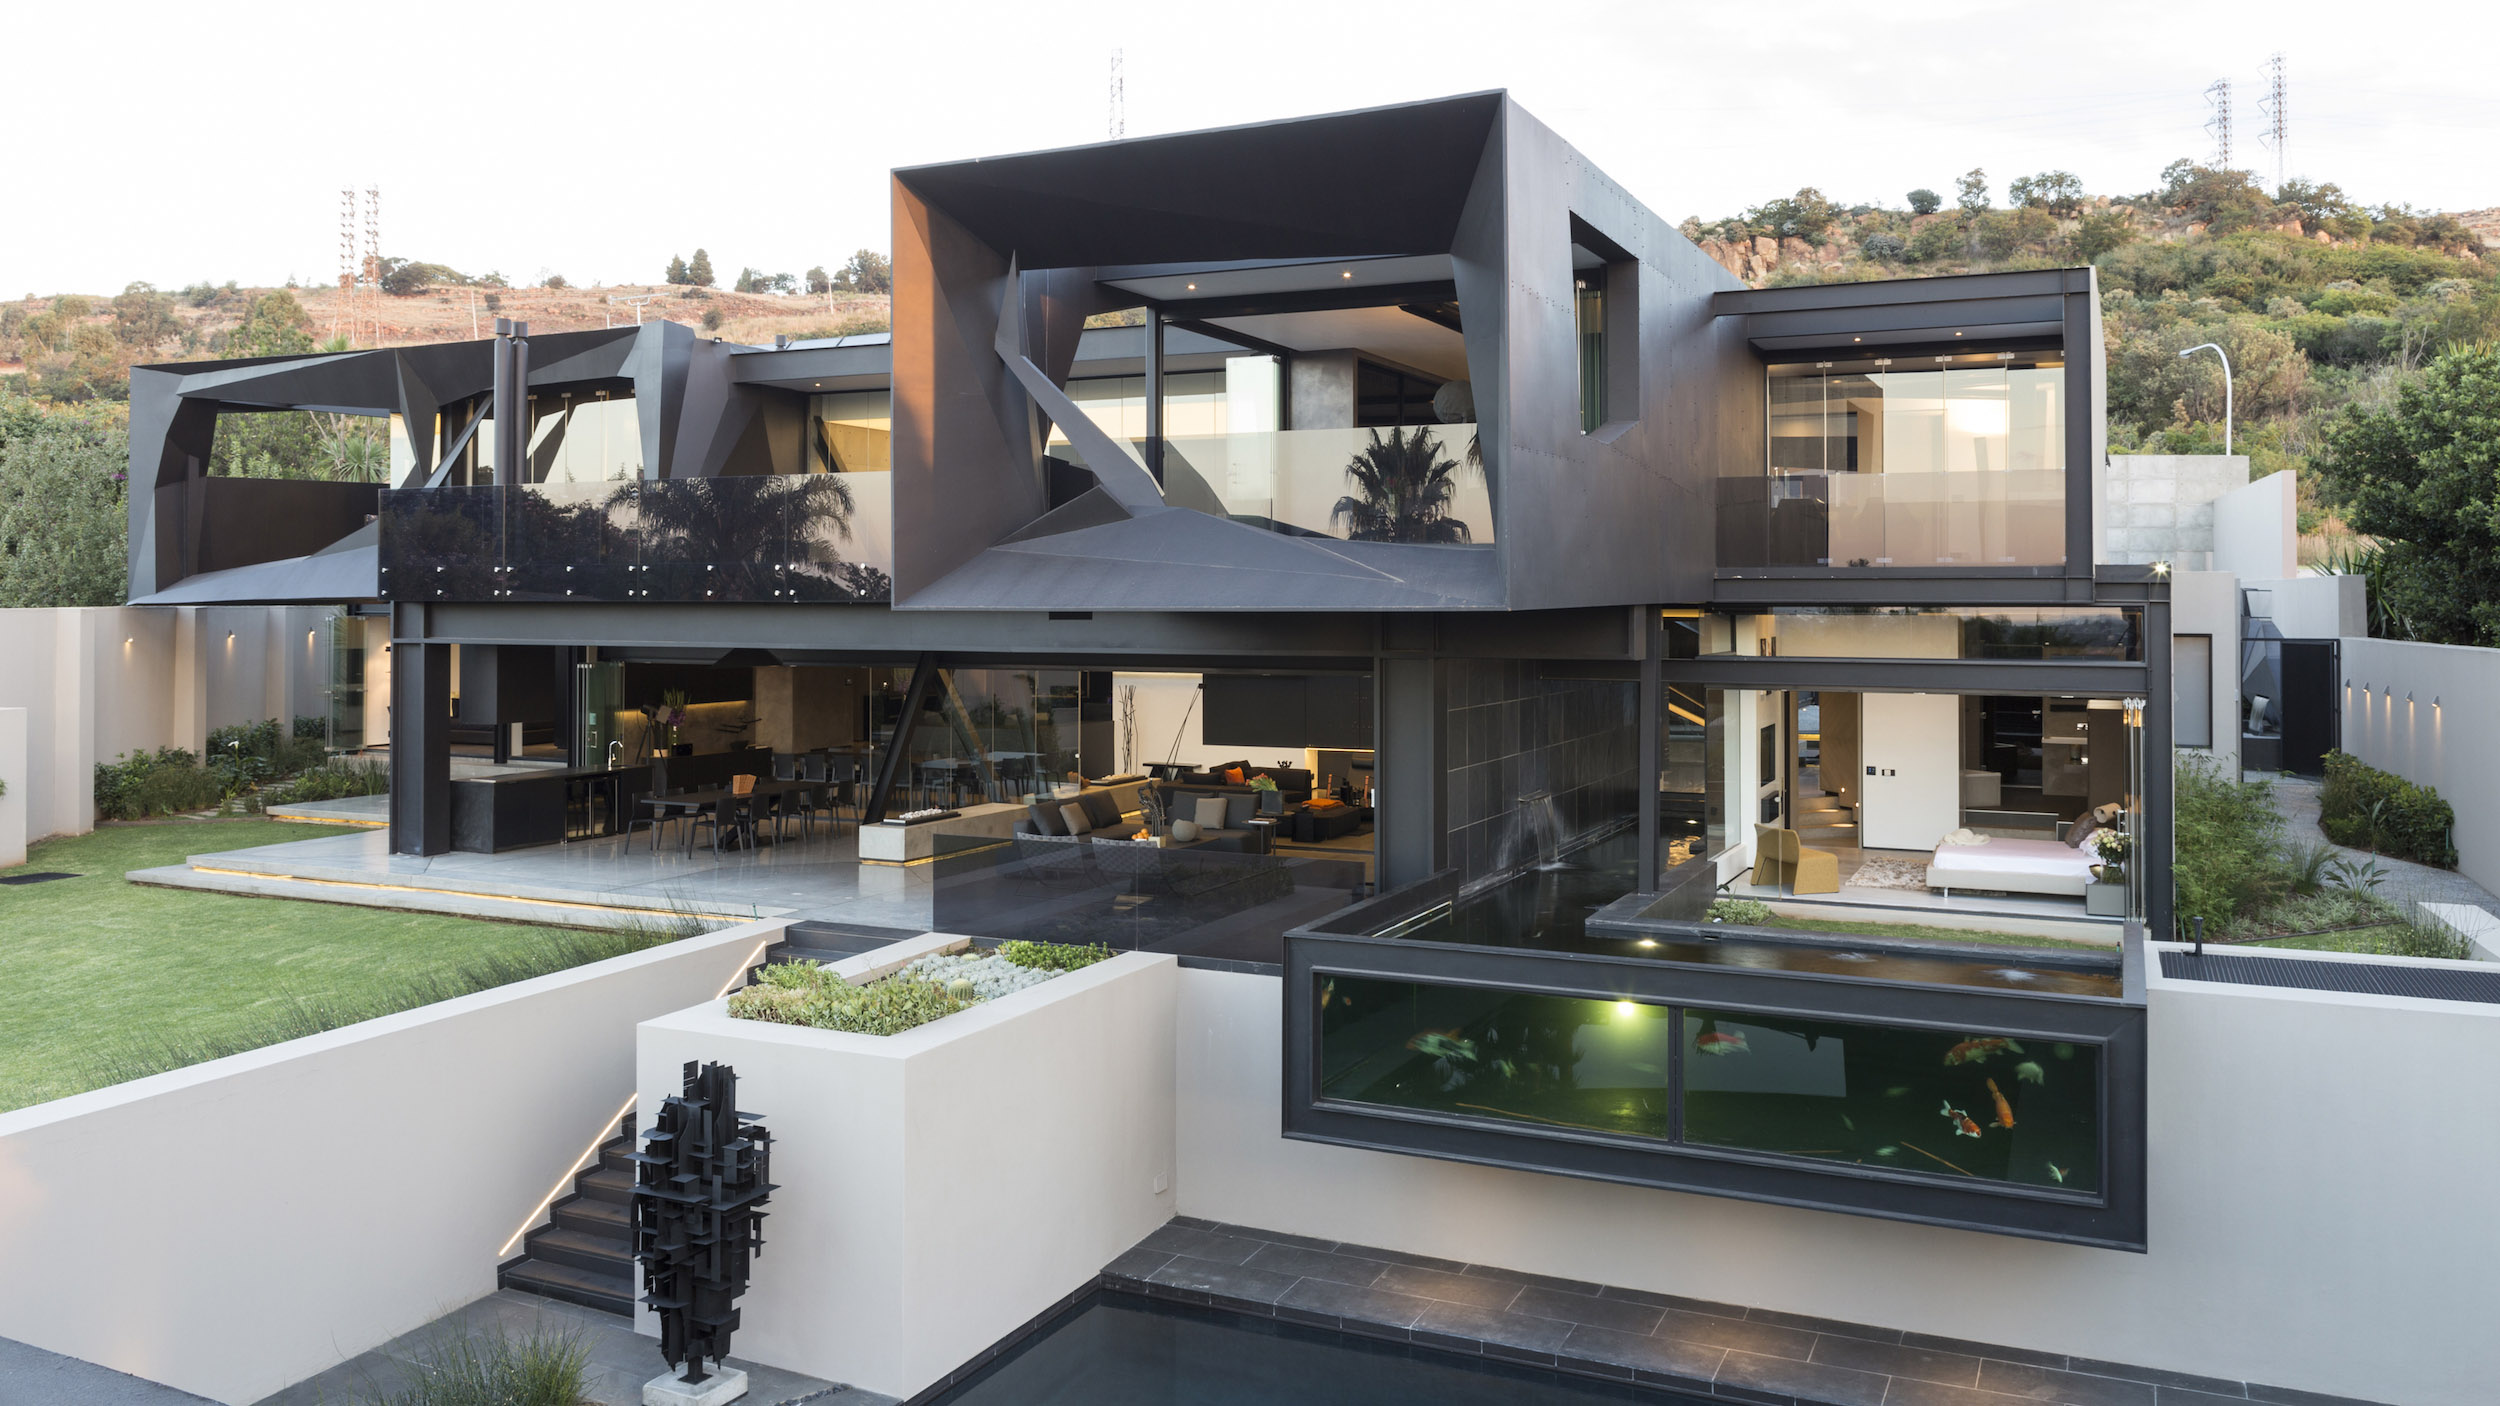 Kloof Road Masterpiece House in Johannesburg by Nico van der Meulen Architects-07